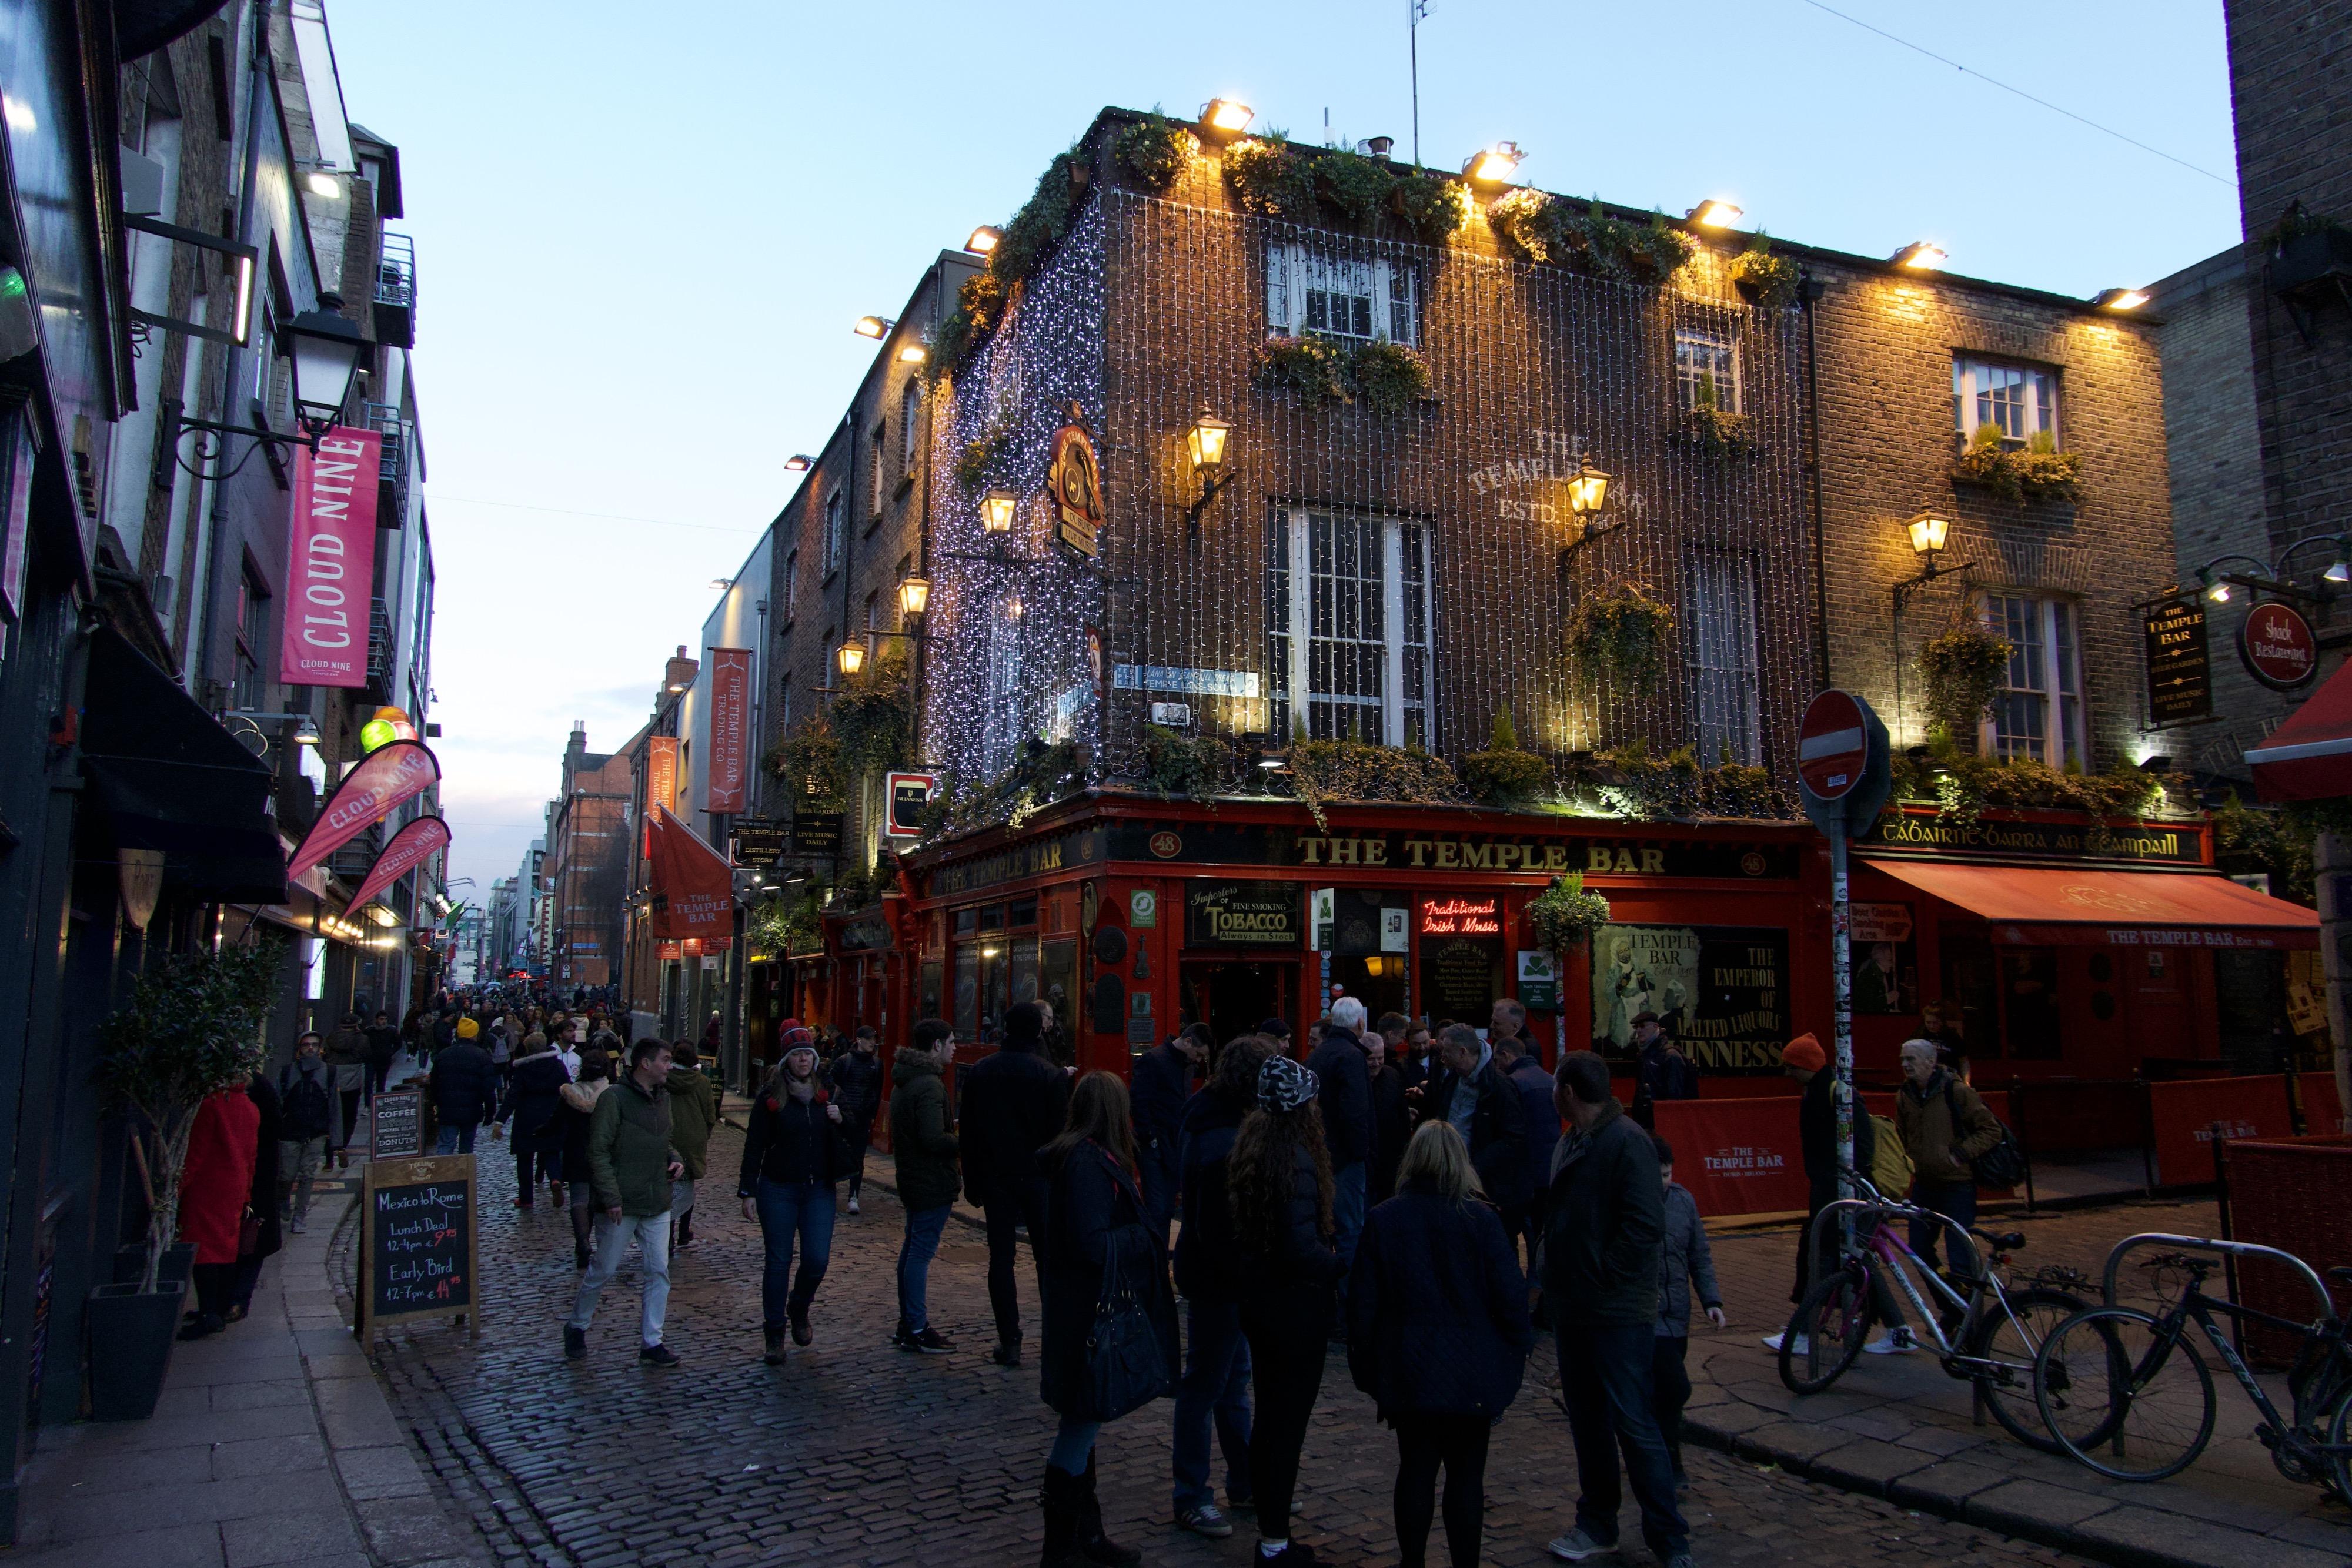 Die Temple Bar im Temple Bar-Viertel in Dublin